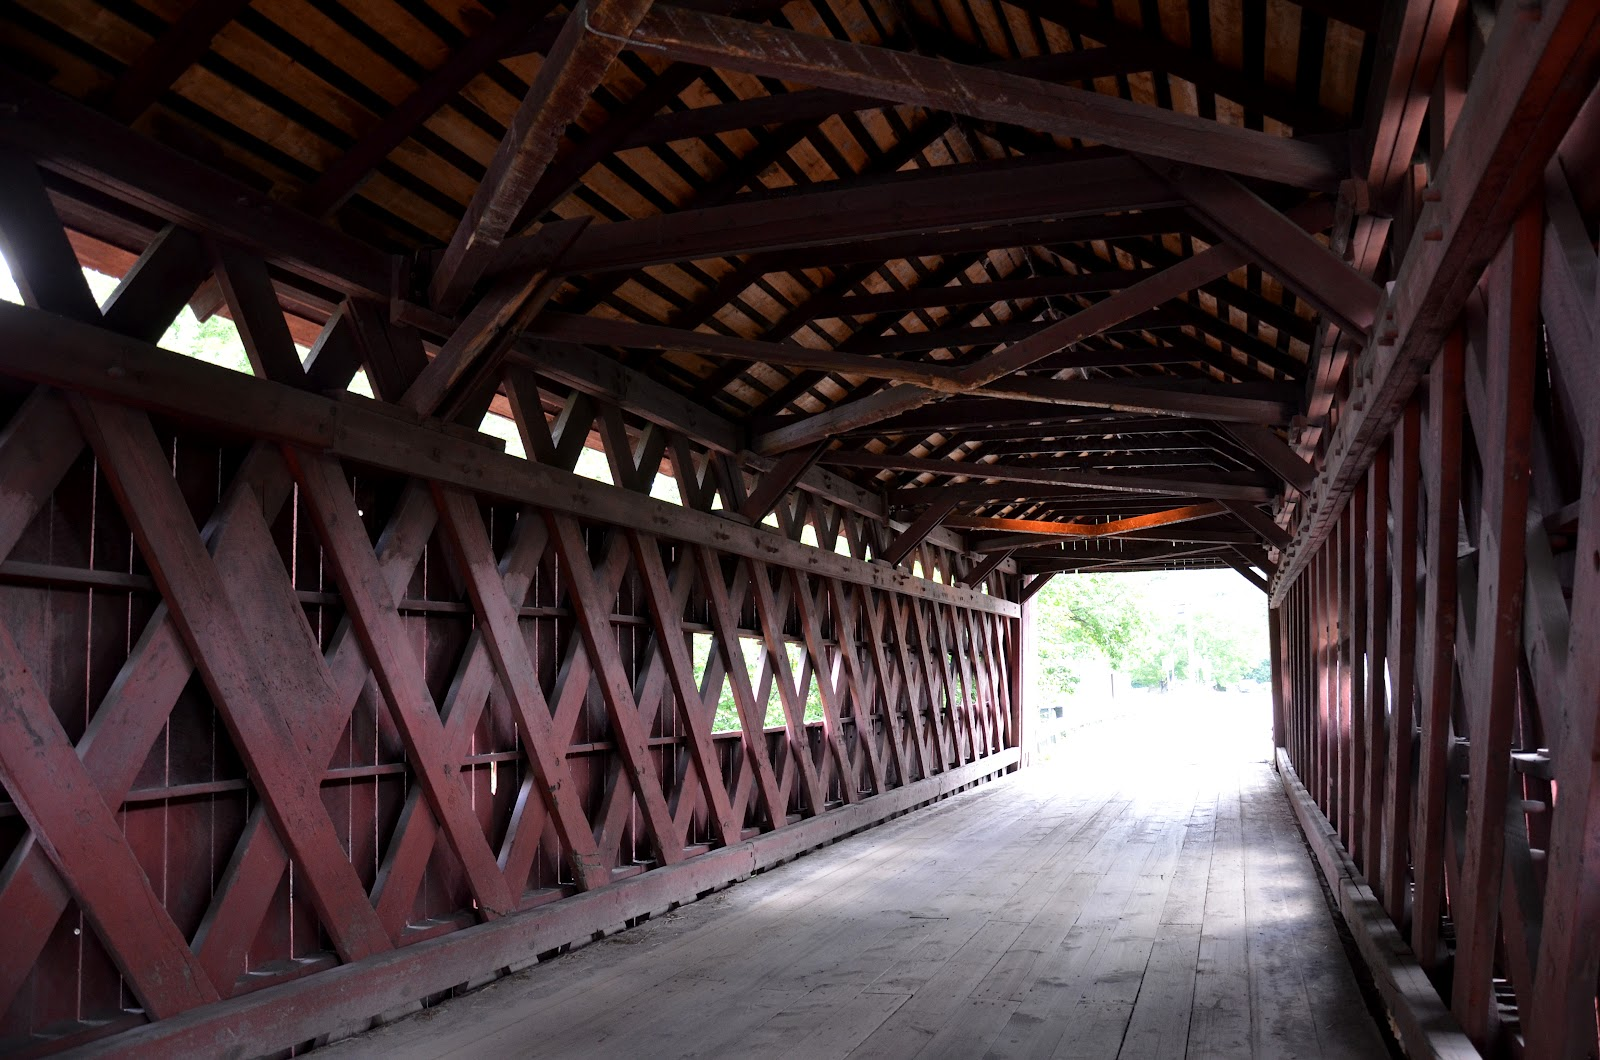 baugh s blog photo essay covered bridges in vermont inside the station bridge in northfield falls vermont note the lattice style design